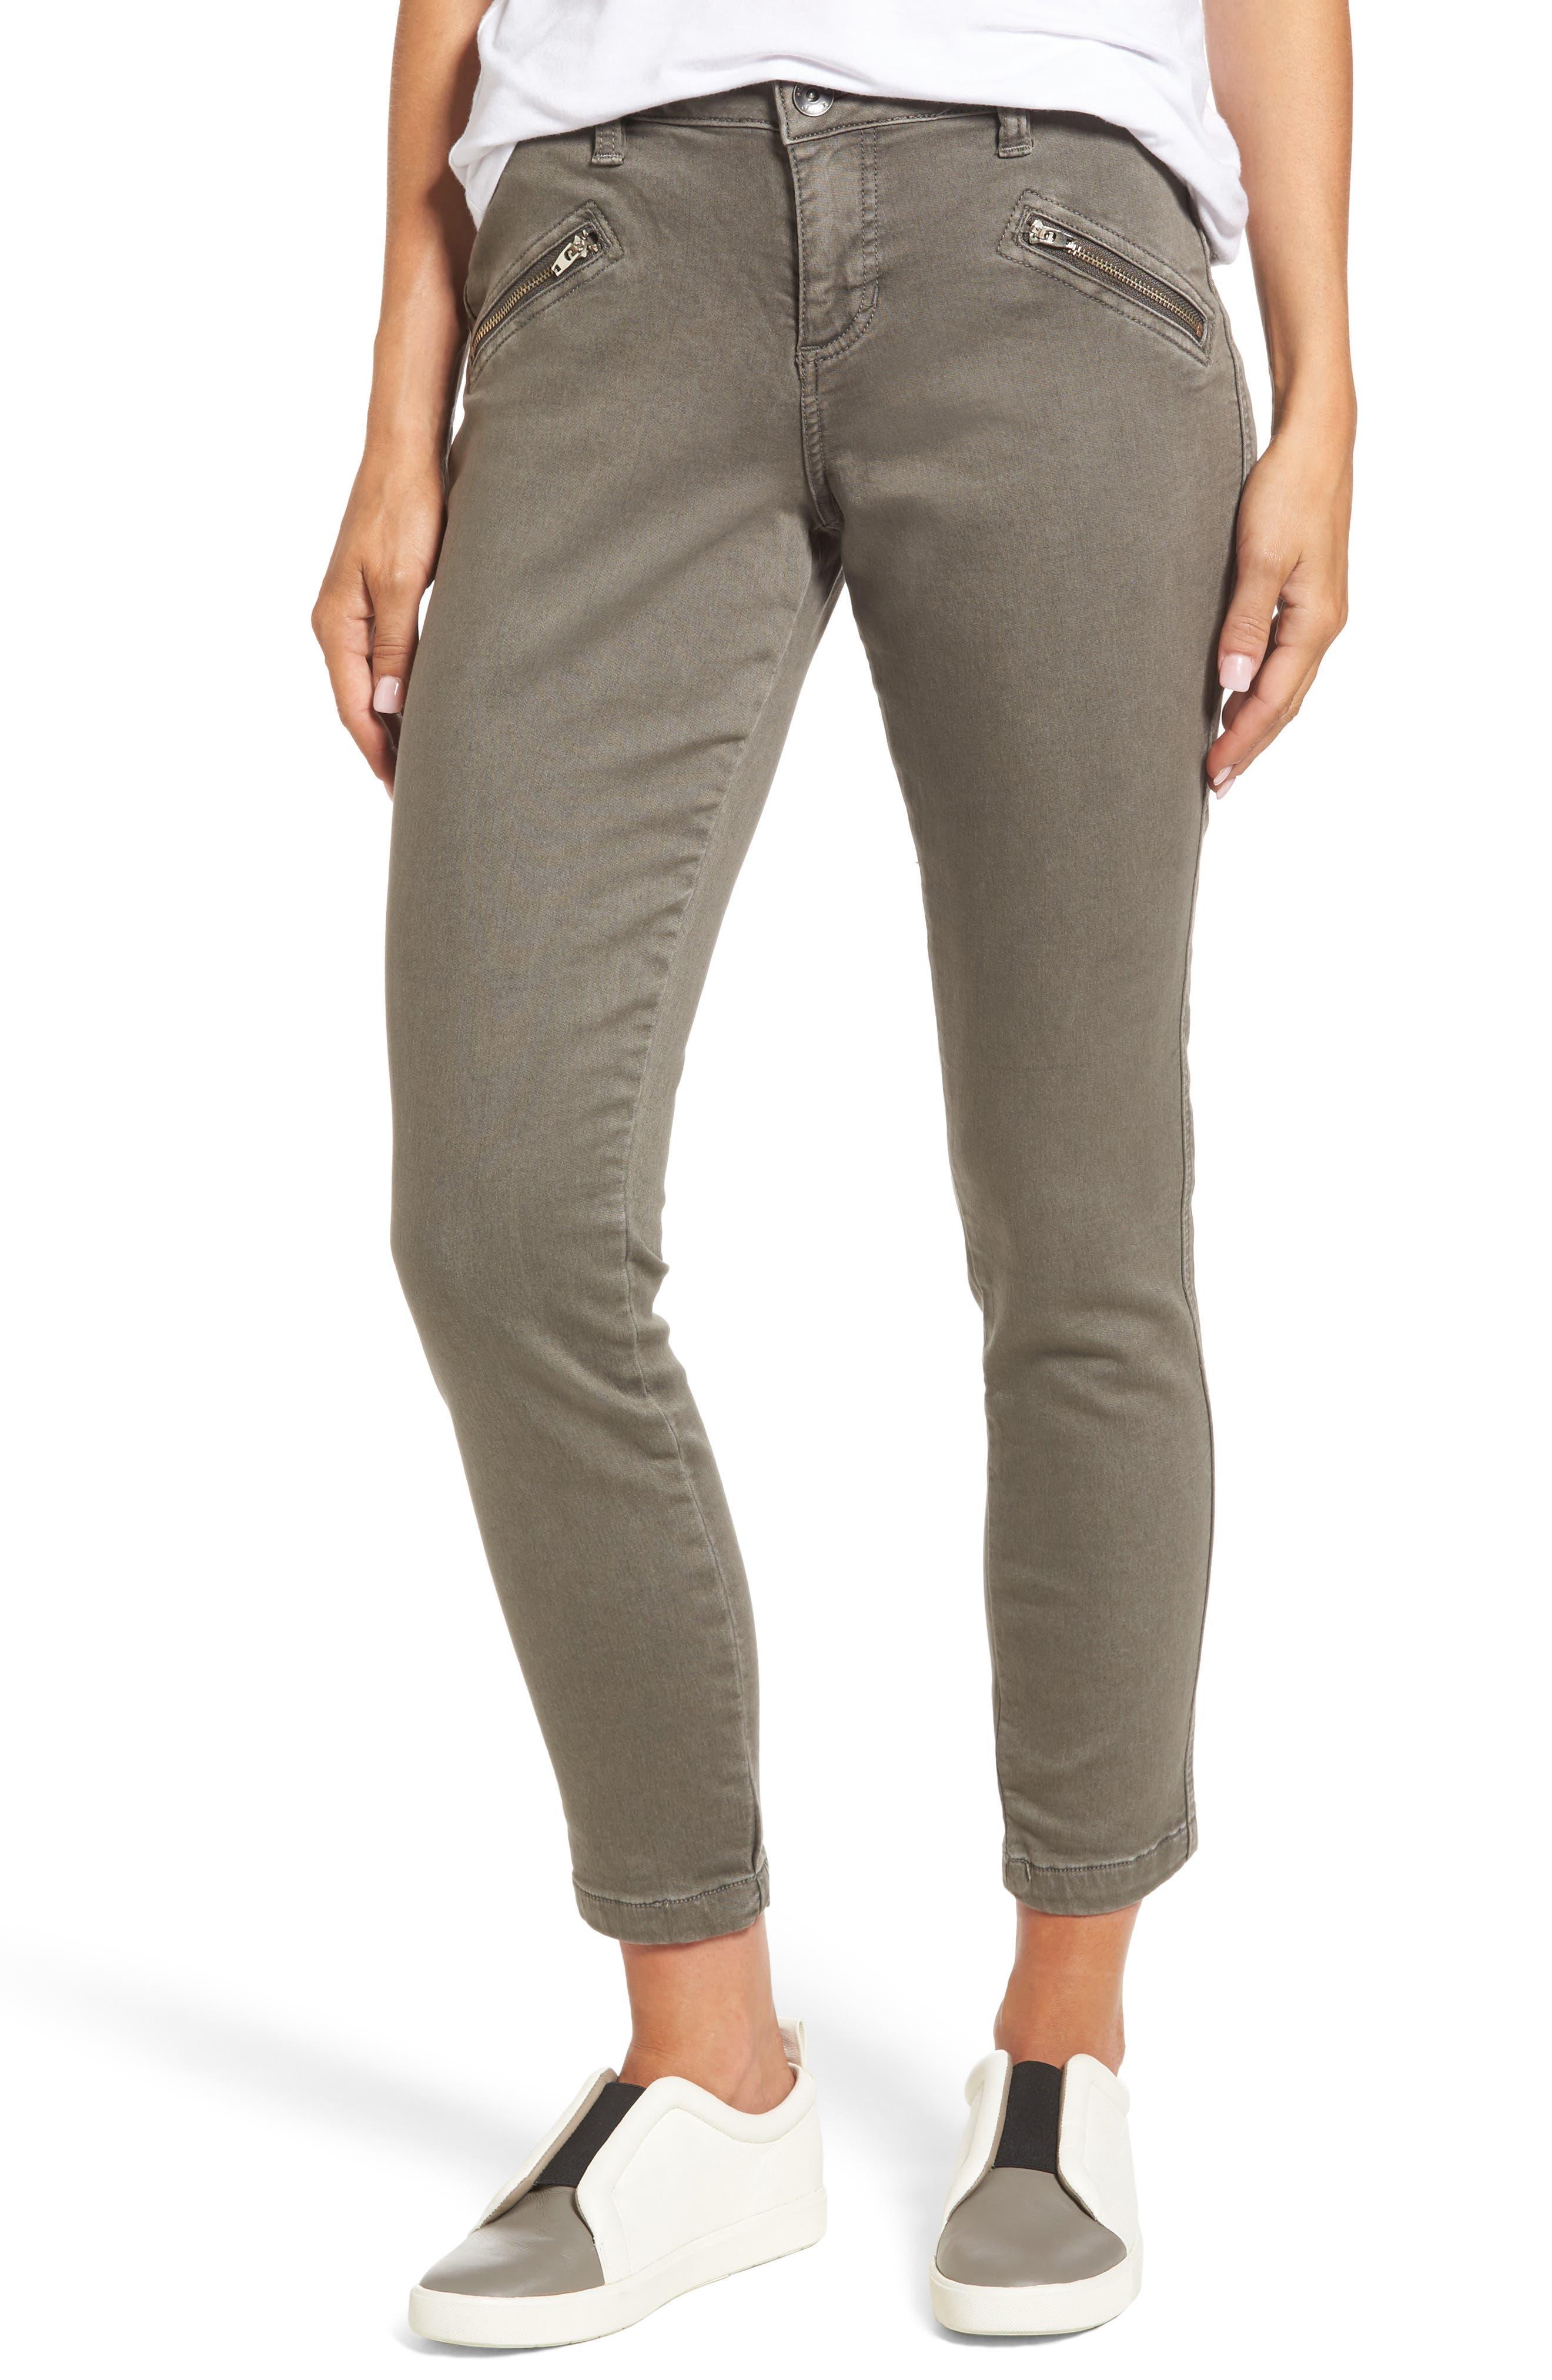 Ryan Knit Skinny Jeans,                         Main,                         color, 205